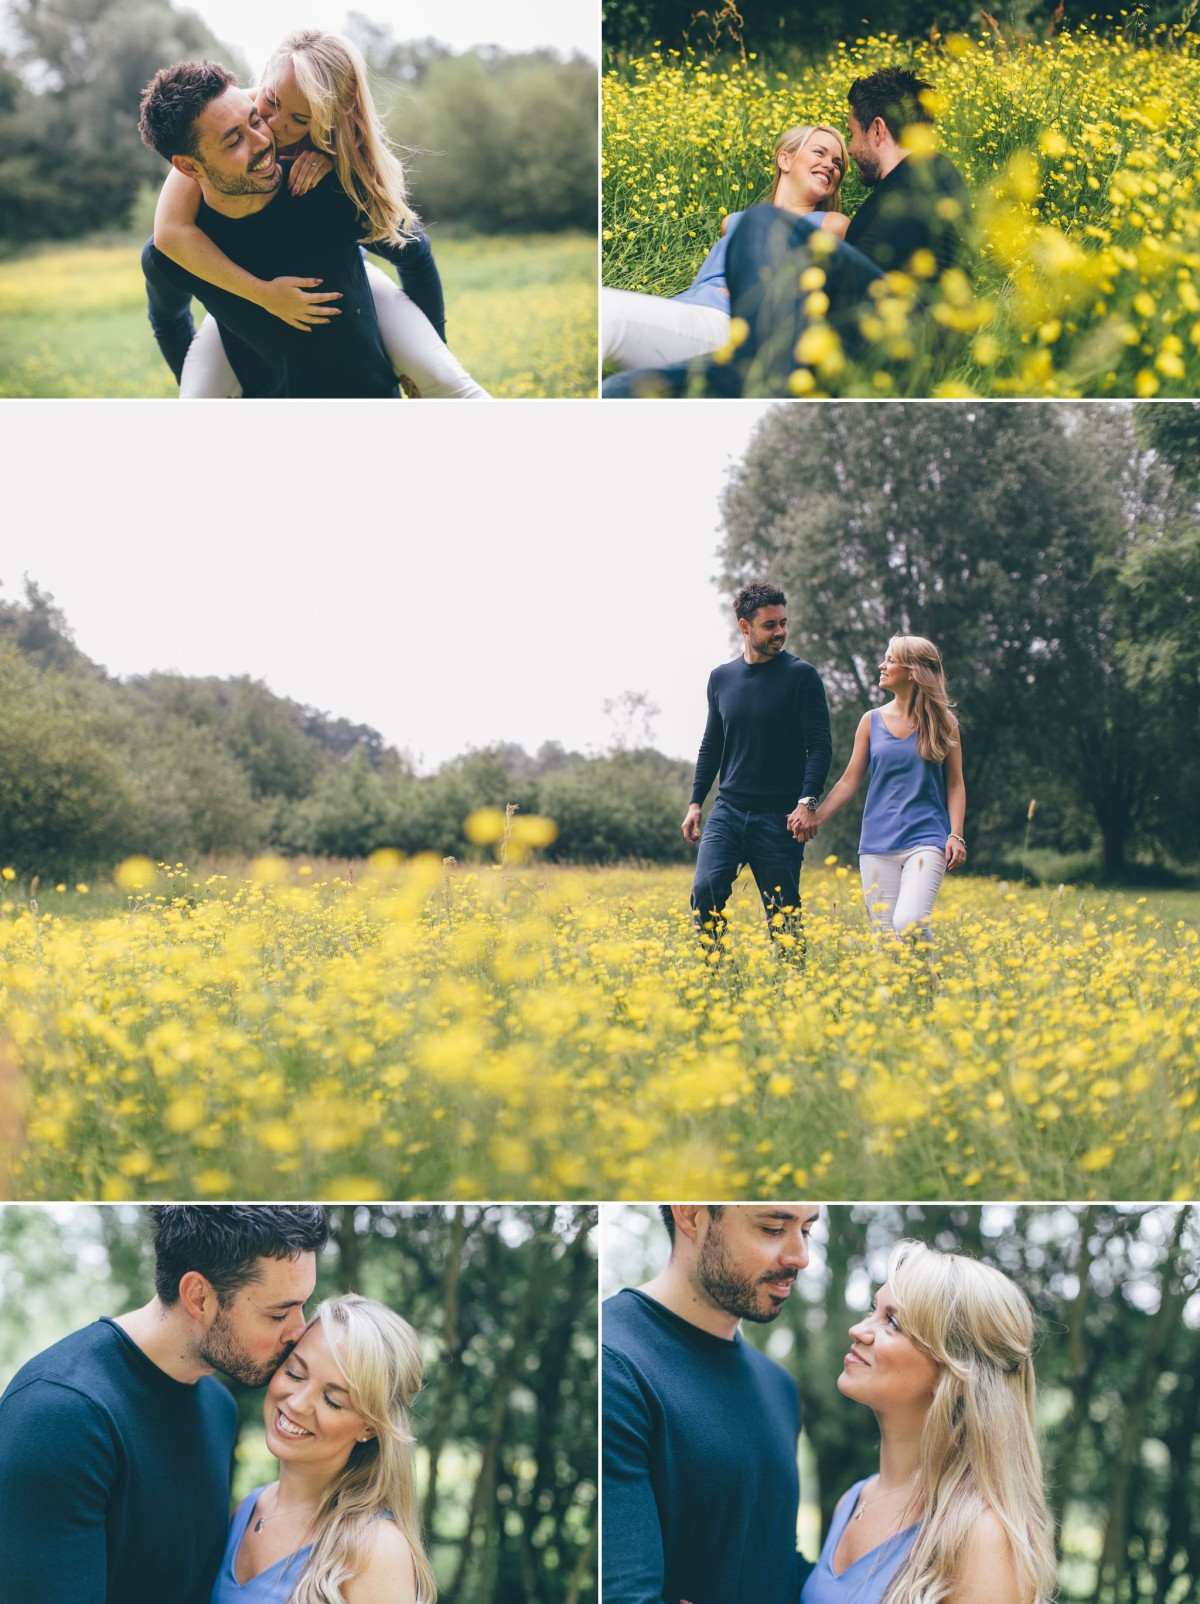 rachel_lambert_photography_welsh_wedding_photographer_harriet_dean_engagement_shoot_caldicot_castle_lower_slaughter_manor_house_ 6